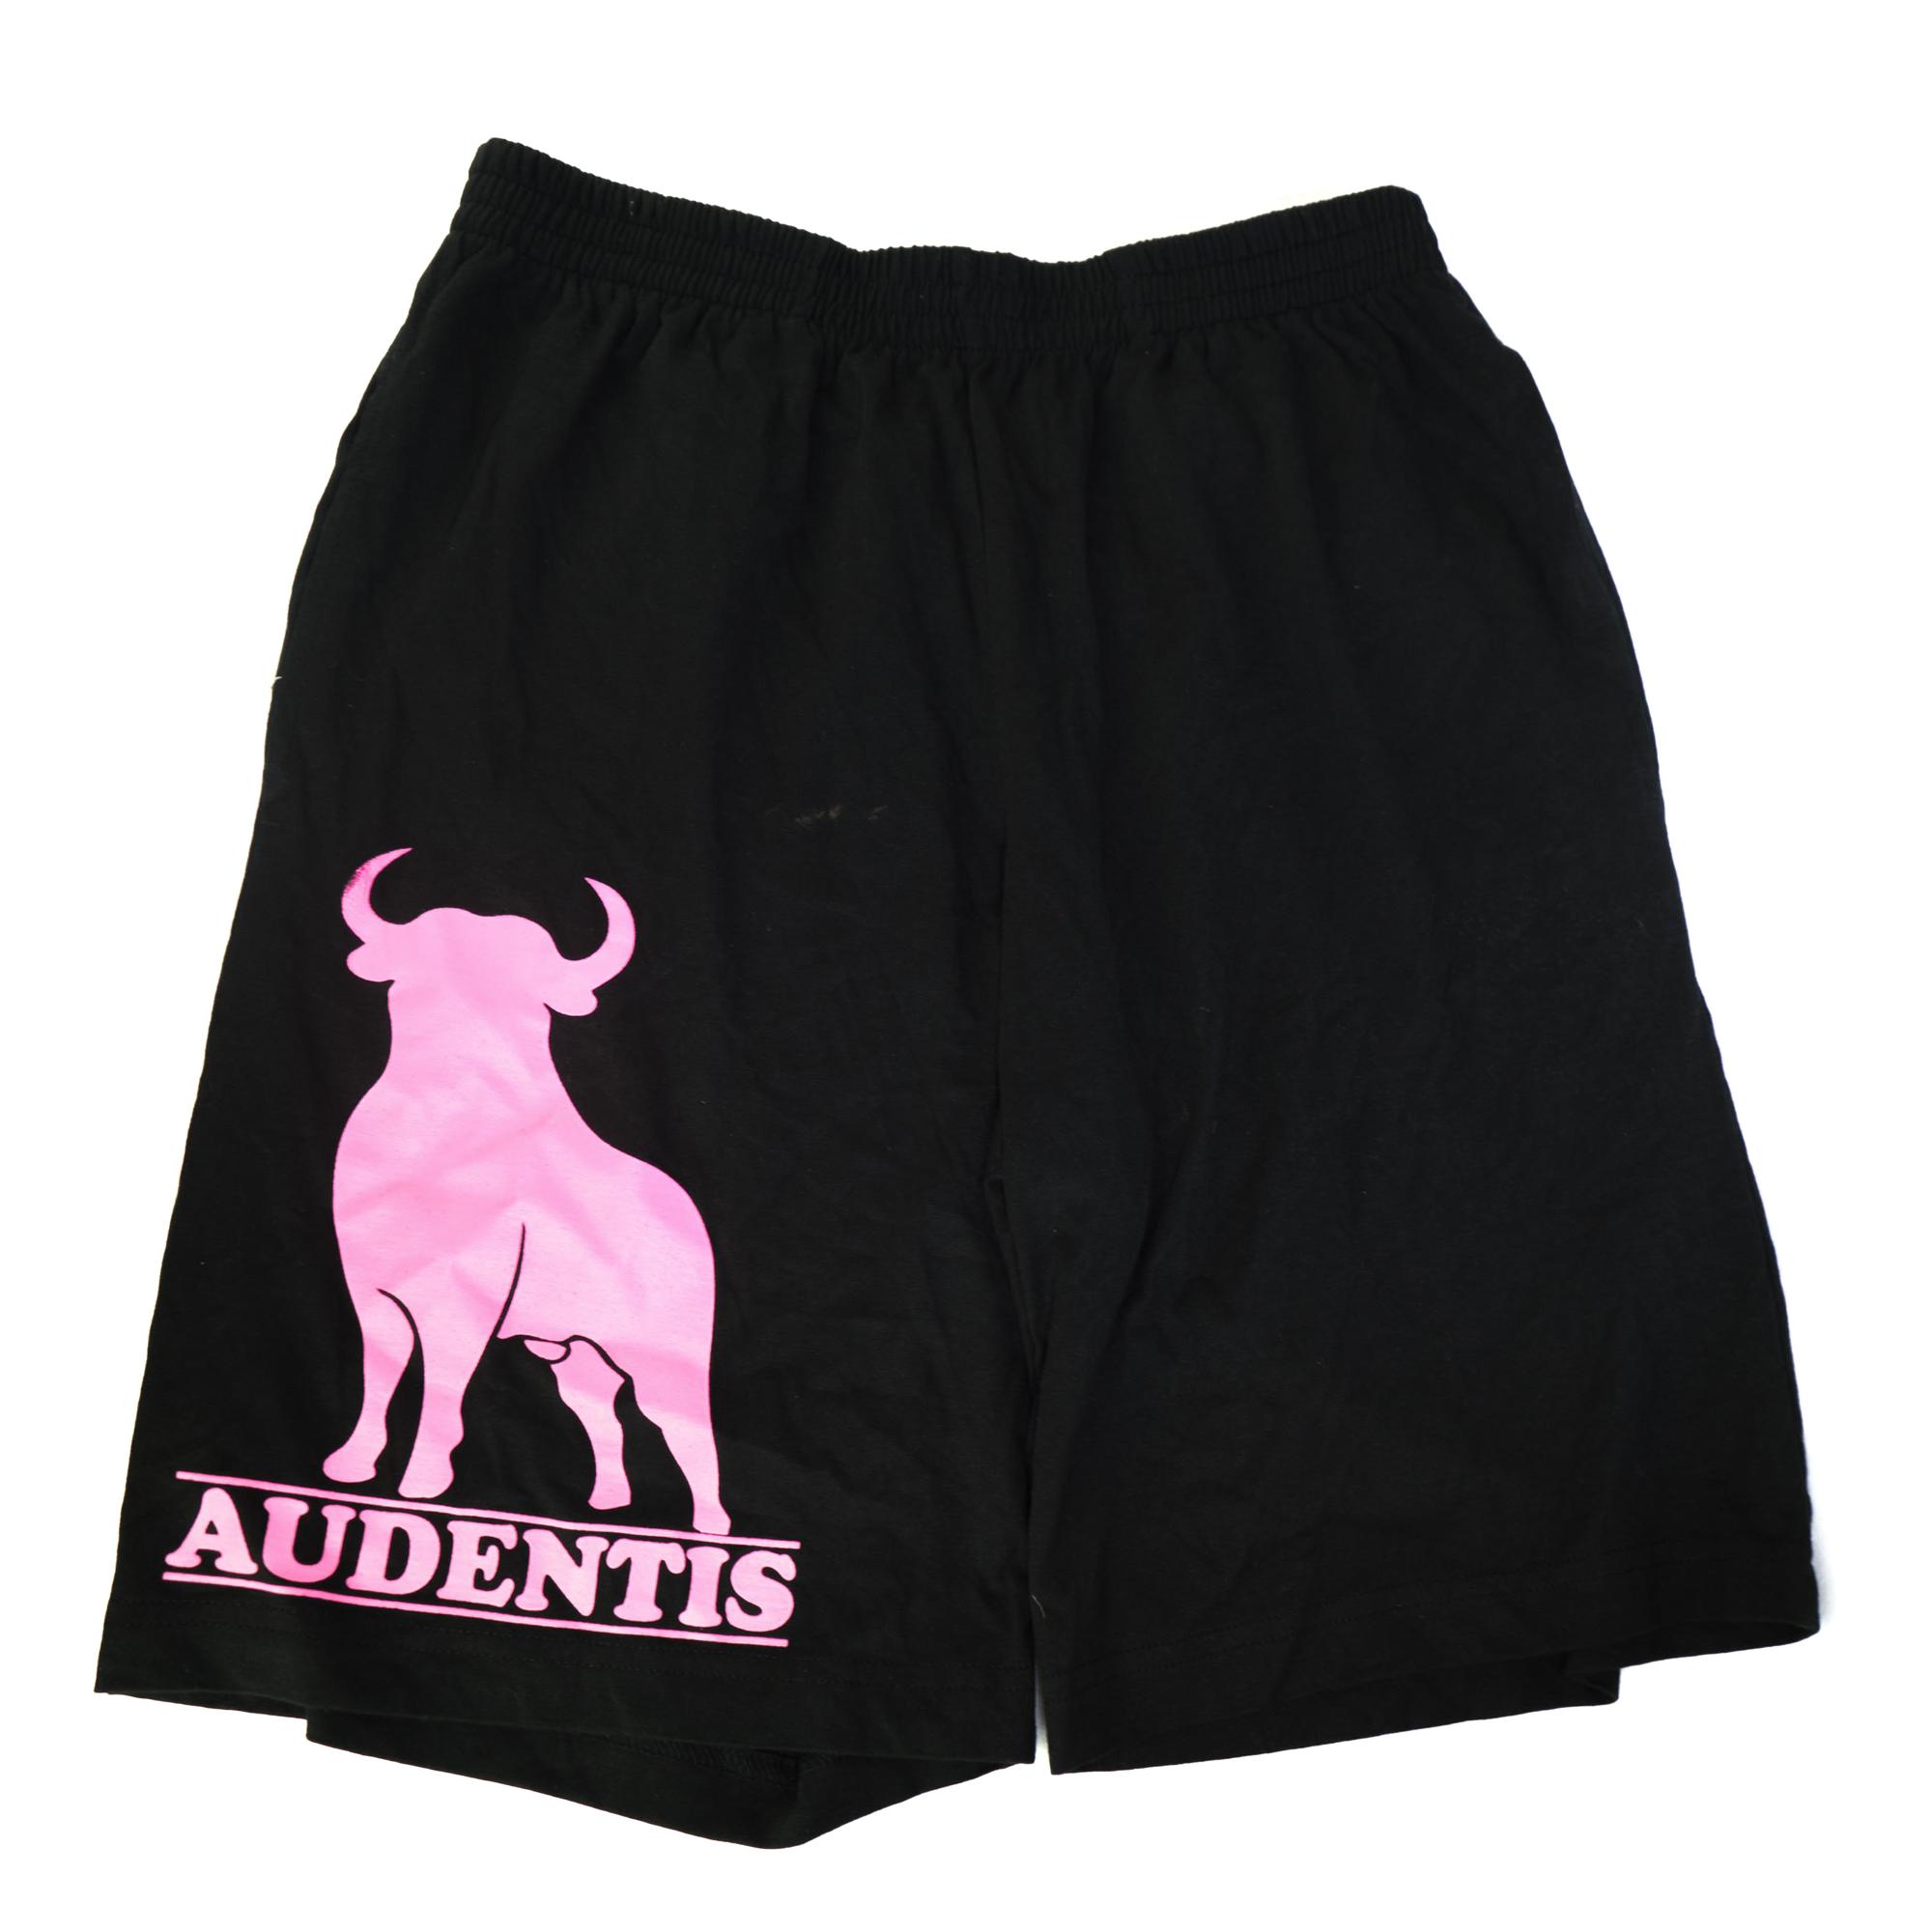 Audentis short